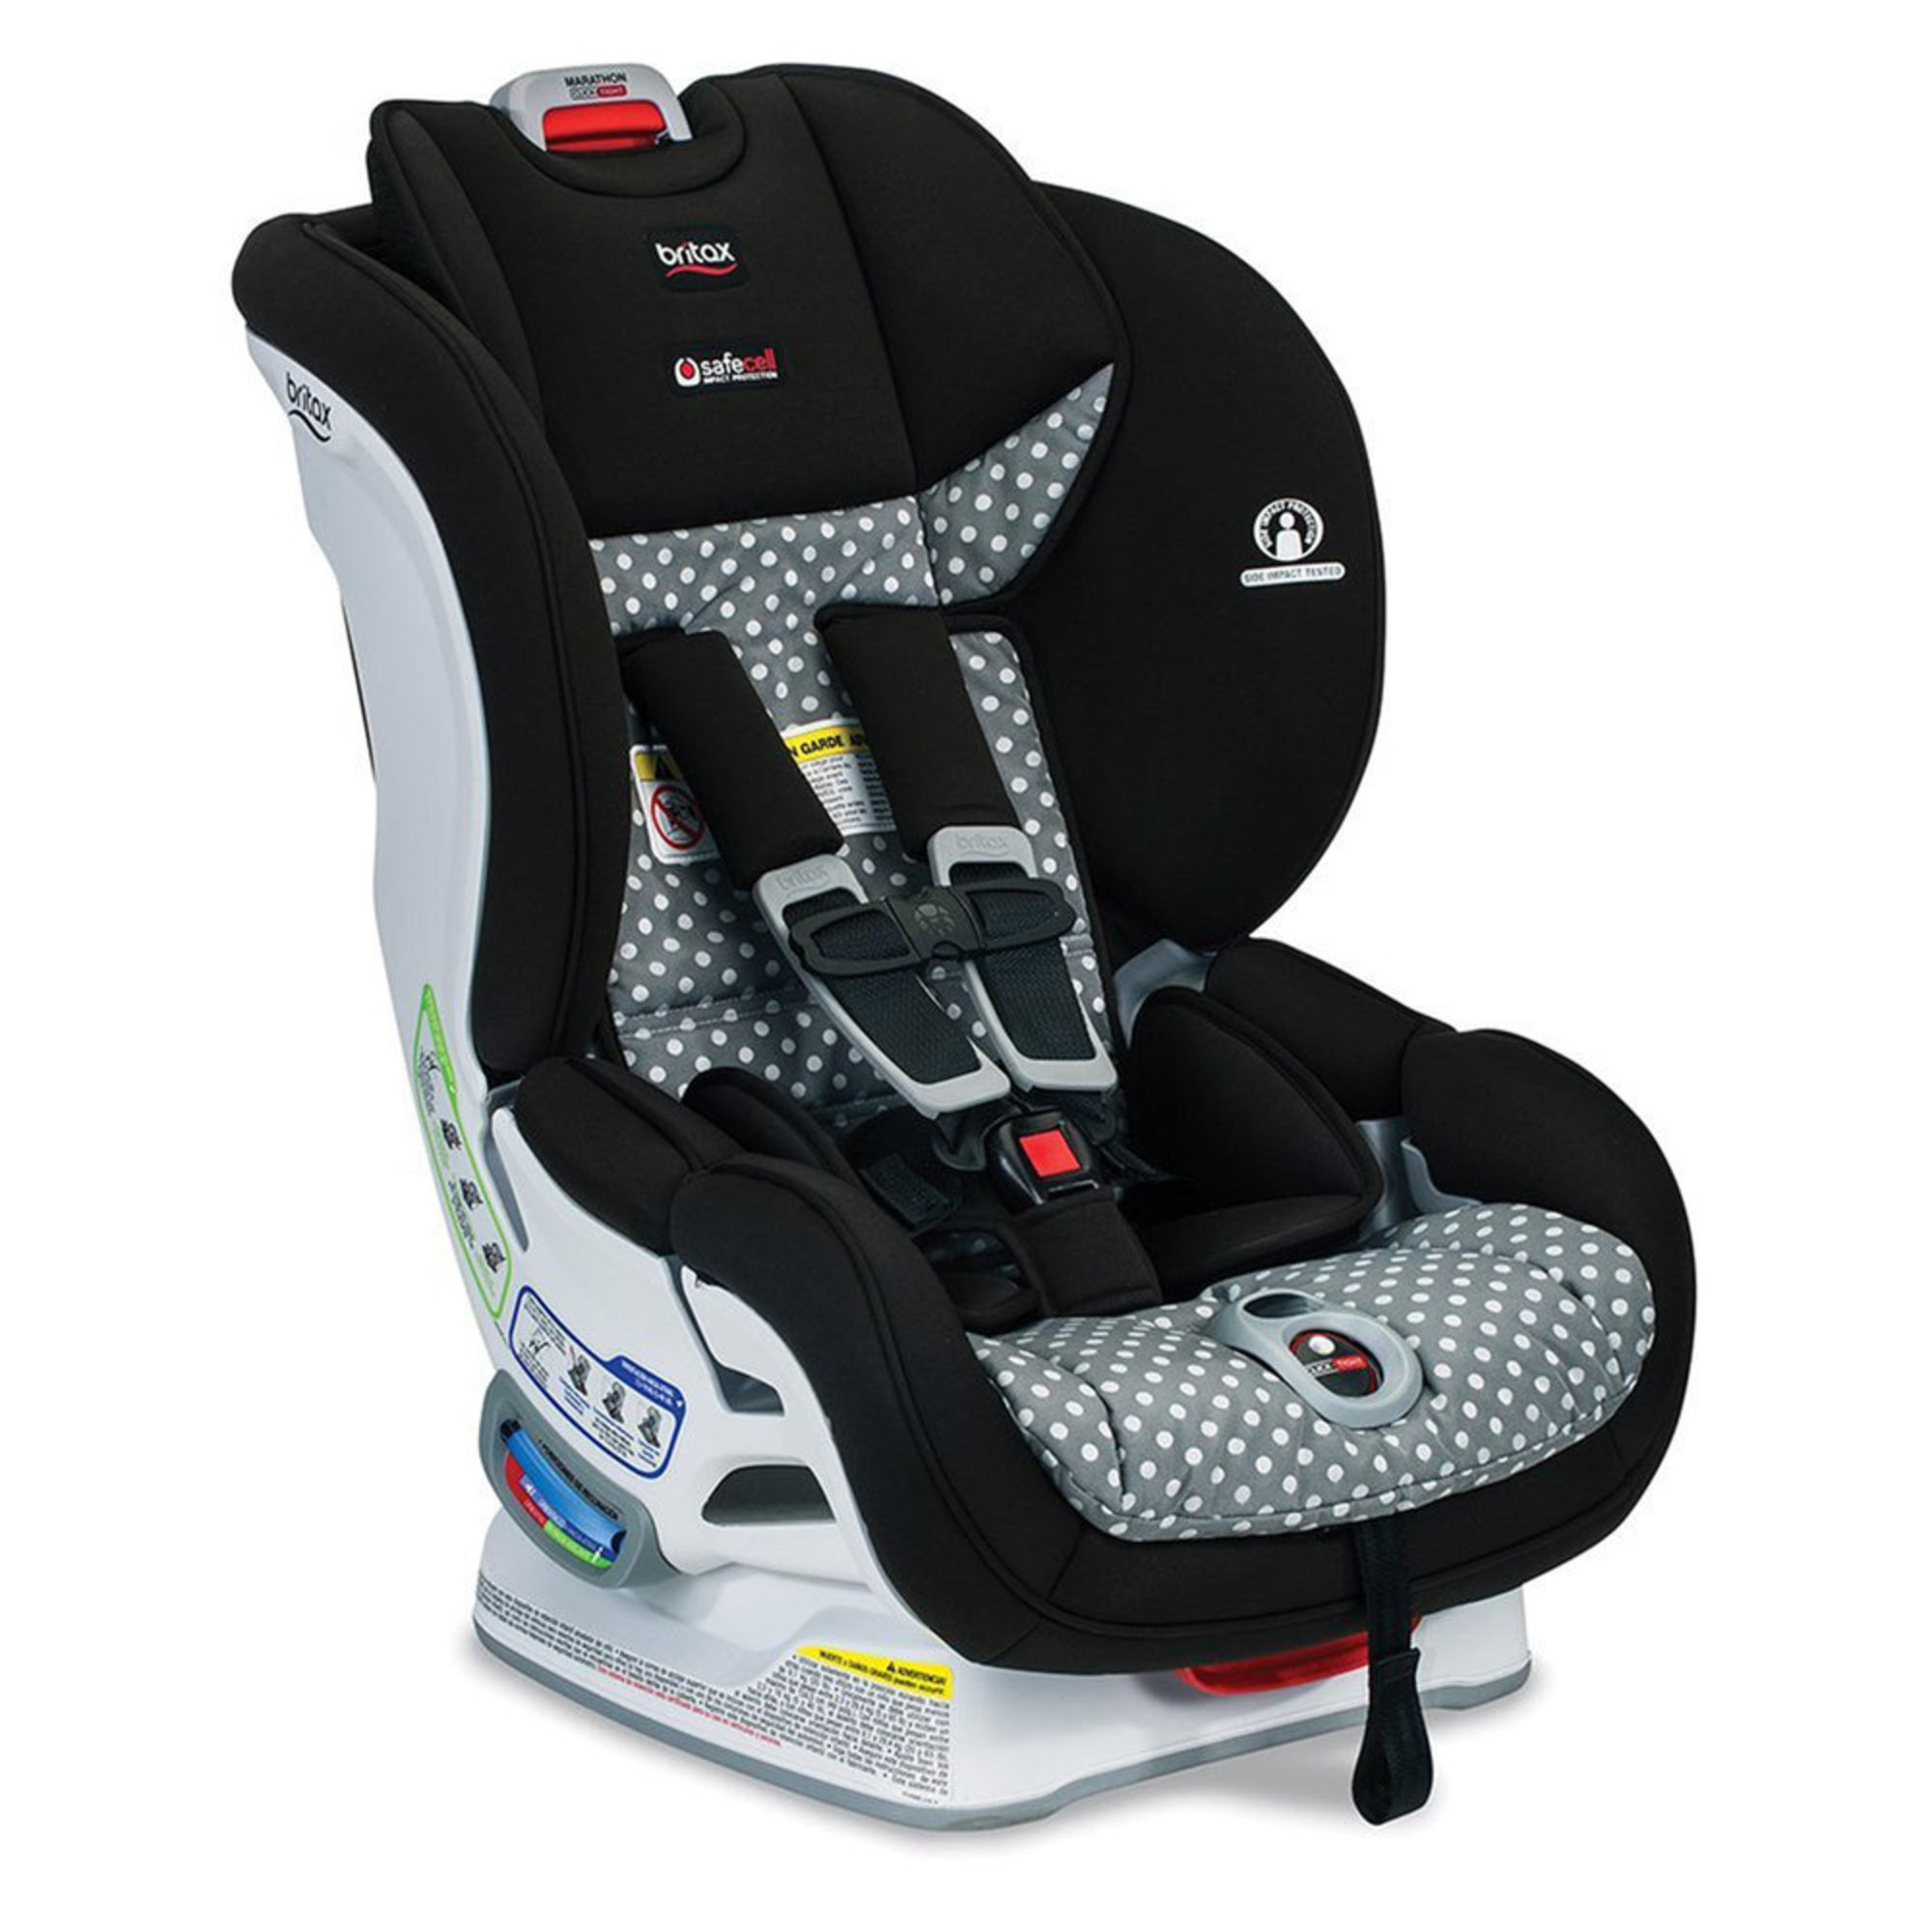 britax marathon clicktight car seat ollie convertible car seats baby kids toys shop. Black Bedroom Furniture Sets. Home Design Ideas